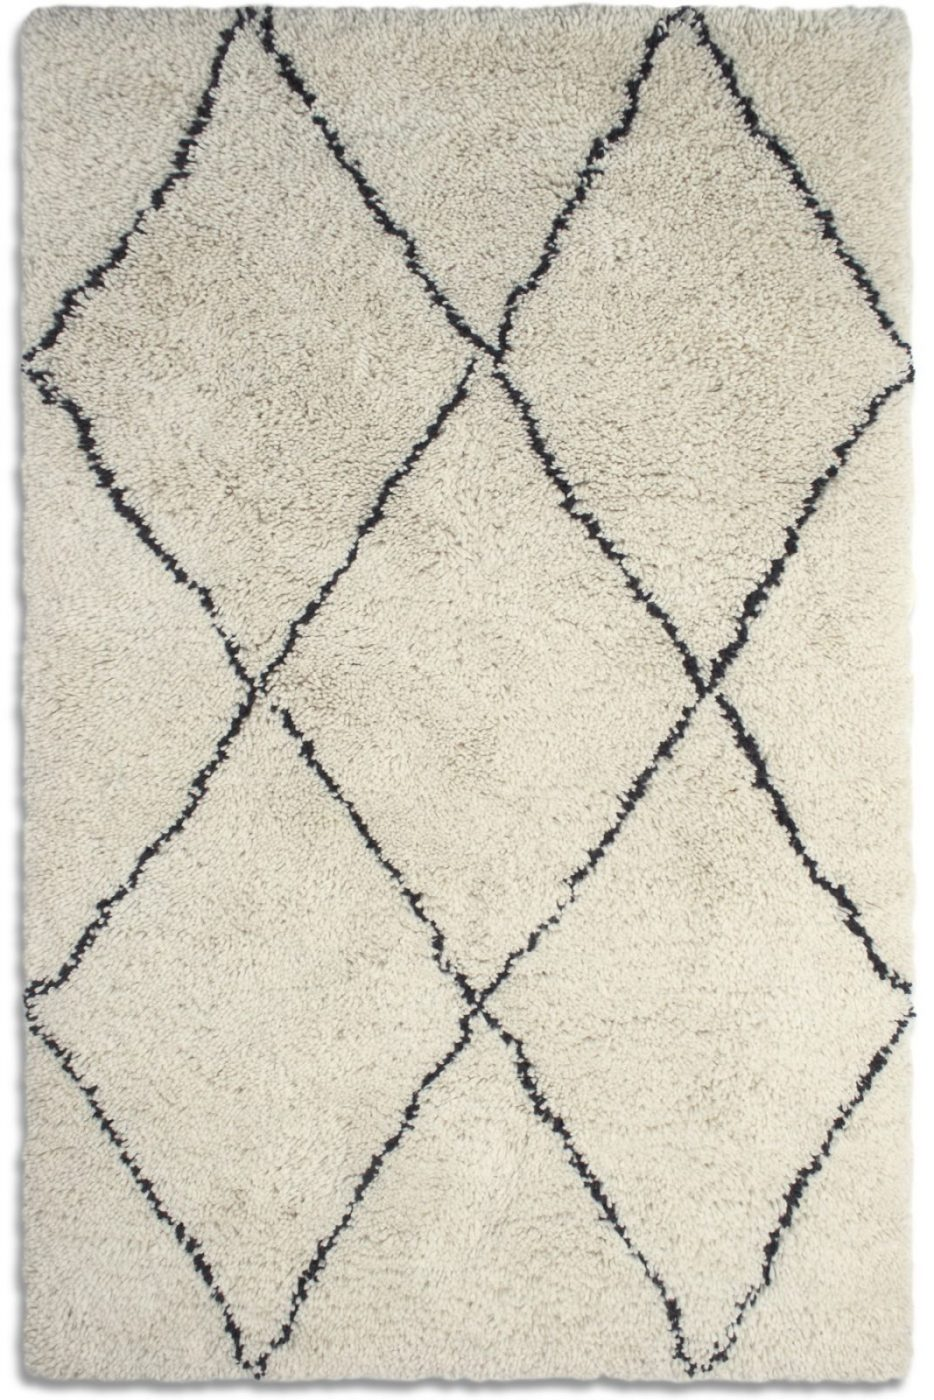 Benni BEN01   Plantation Rug Company   Best at Flooring